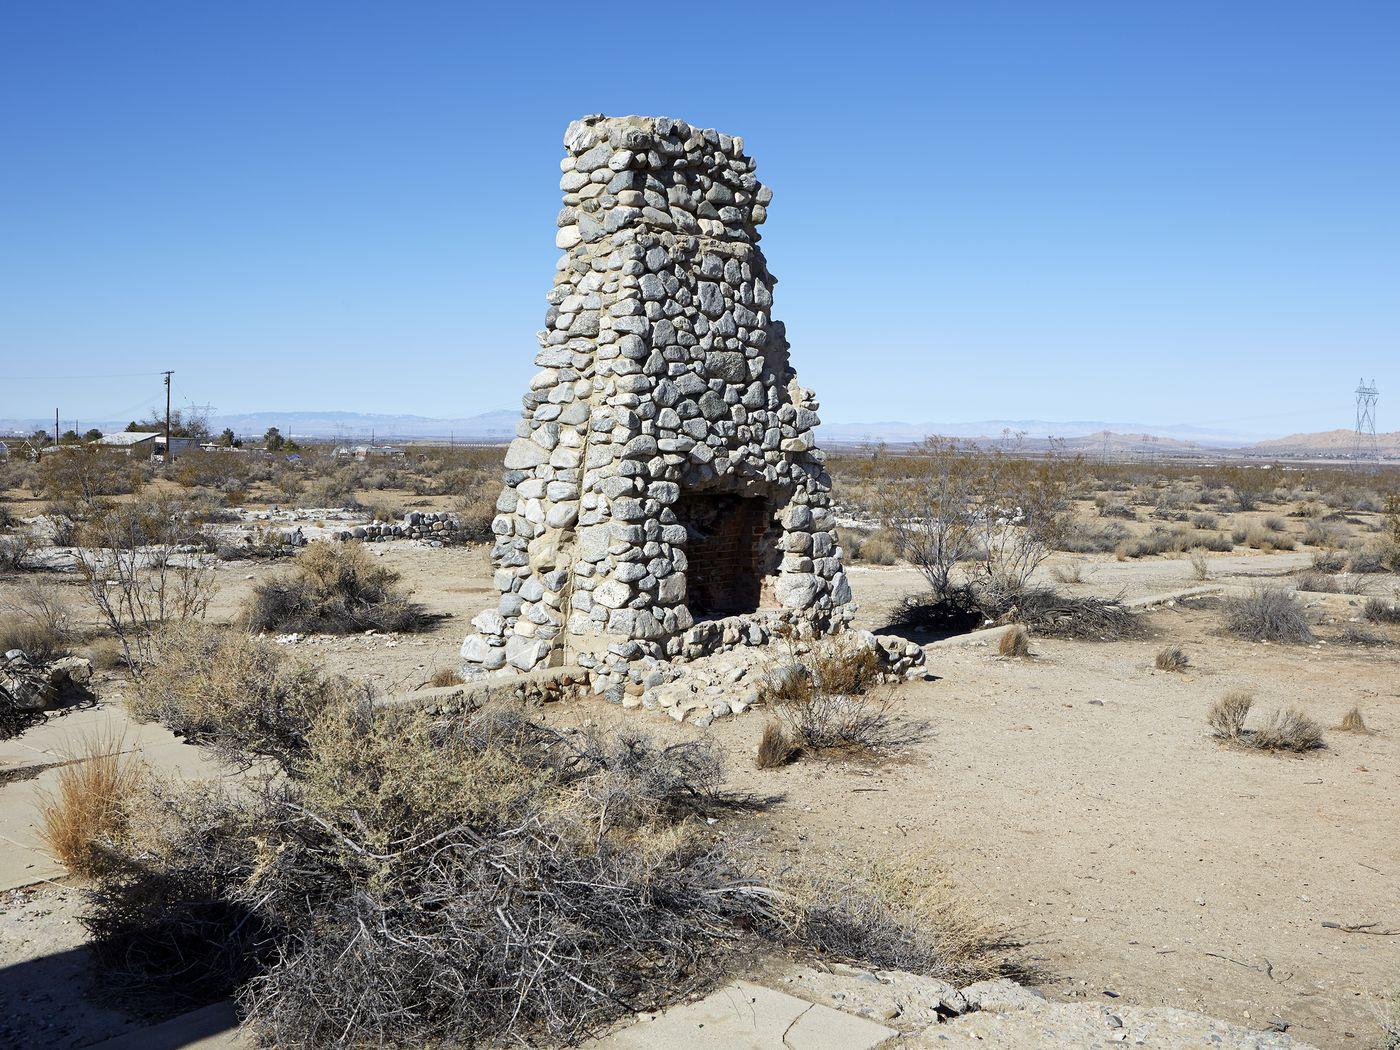 Llano del Rio: The ruins of LA's socialist colony - Curbed LA